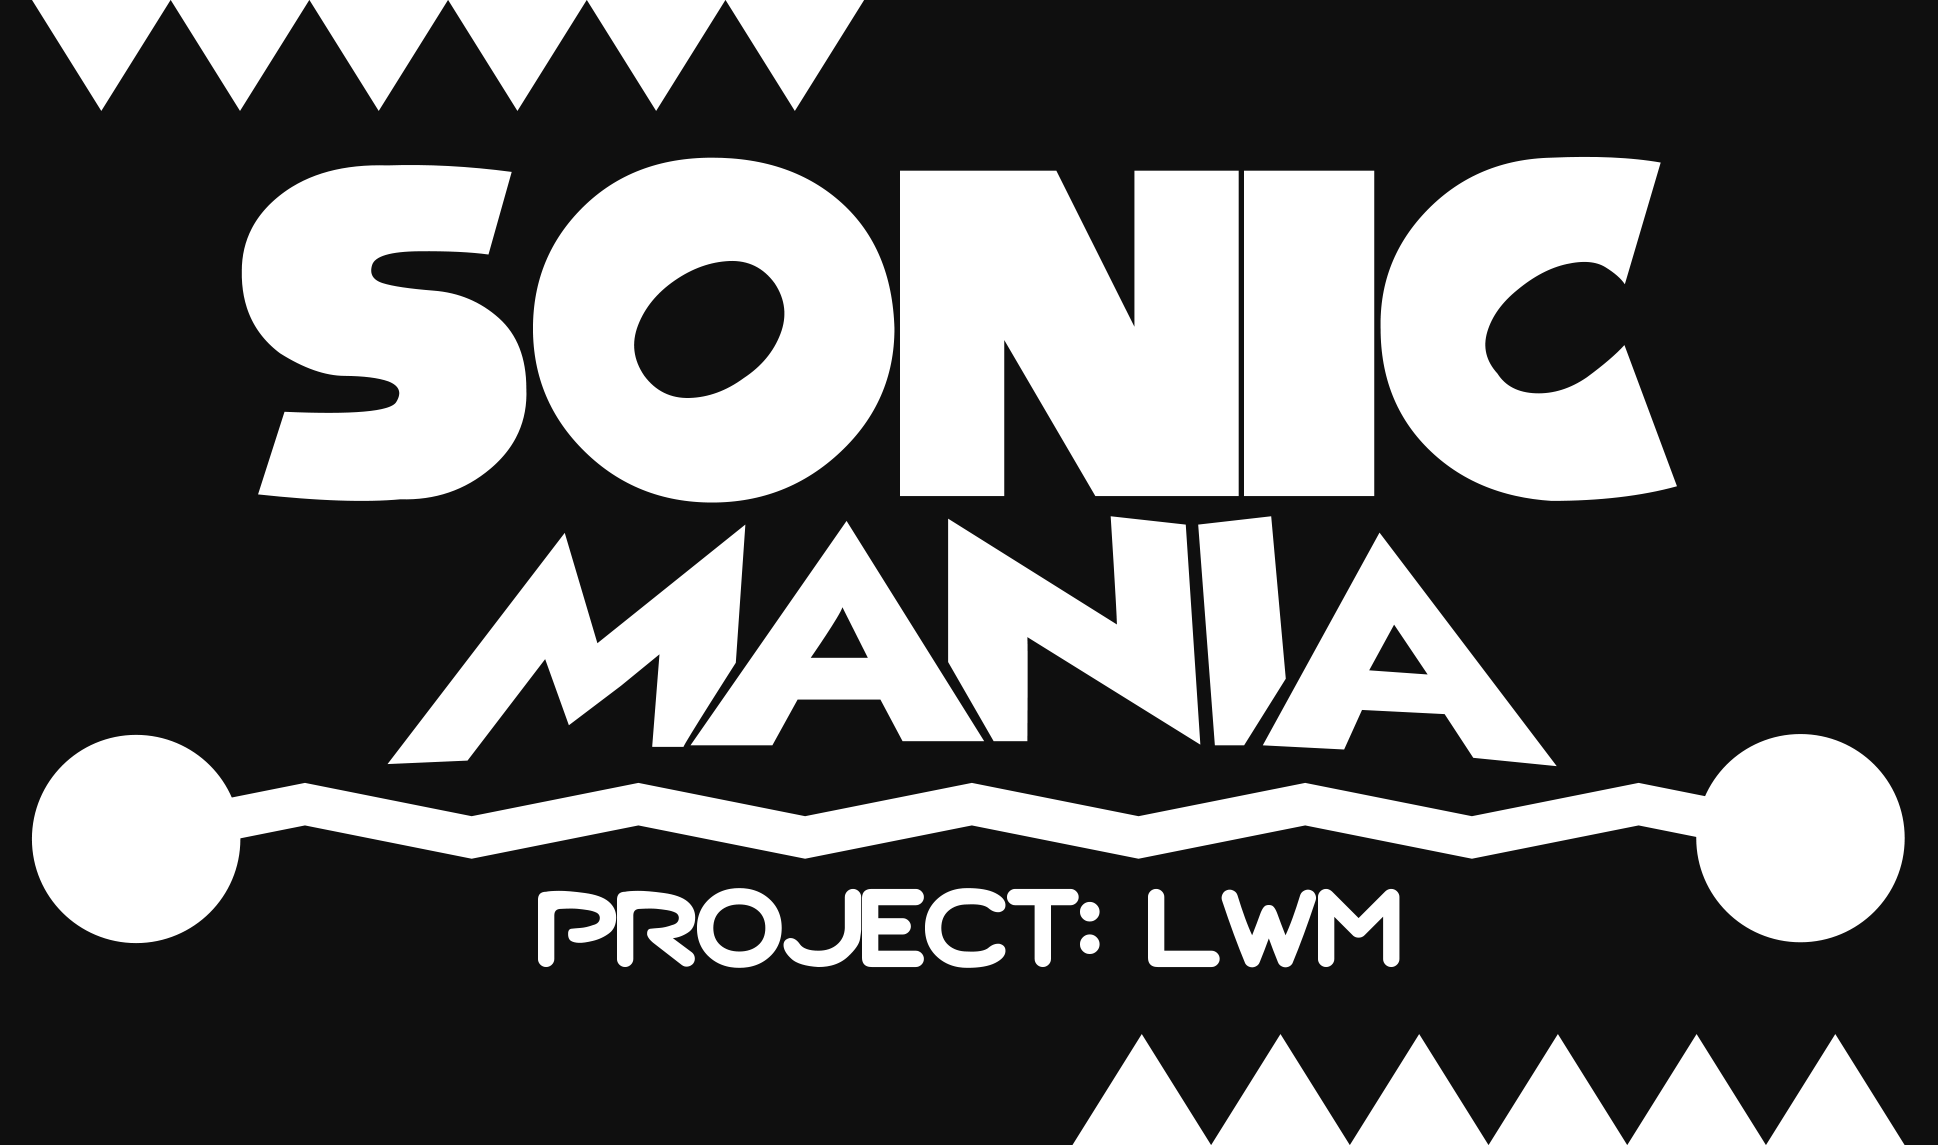 Sonic Mania Project: LWM (Live